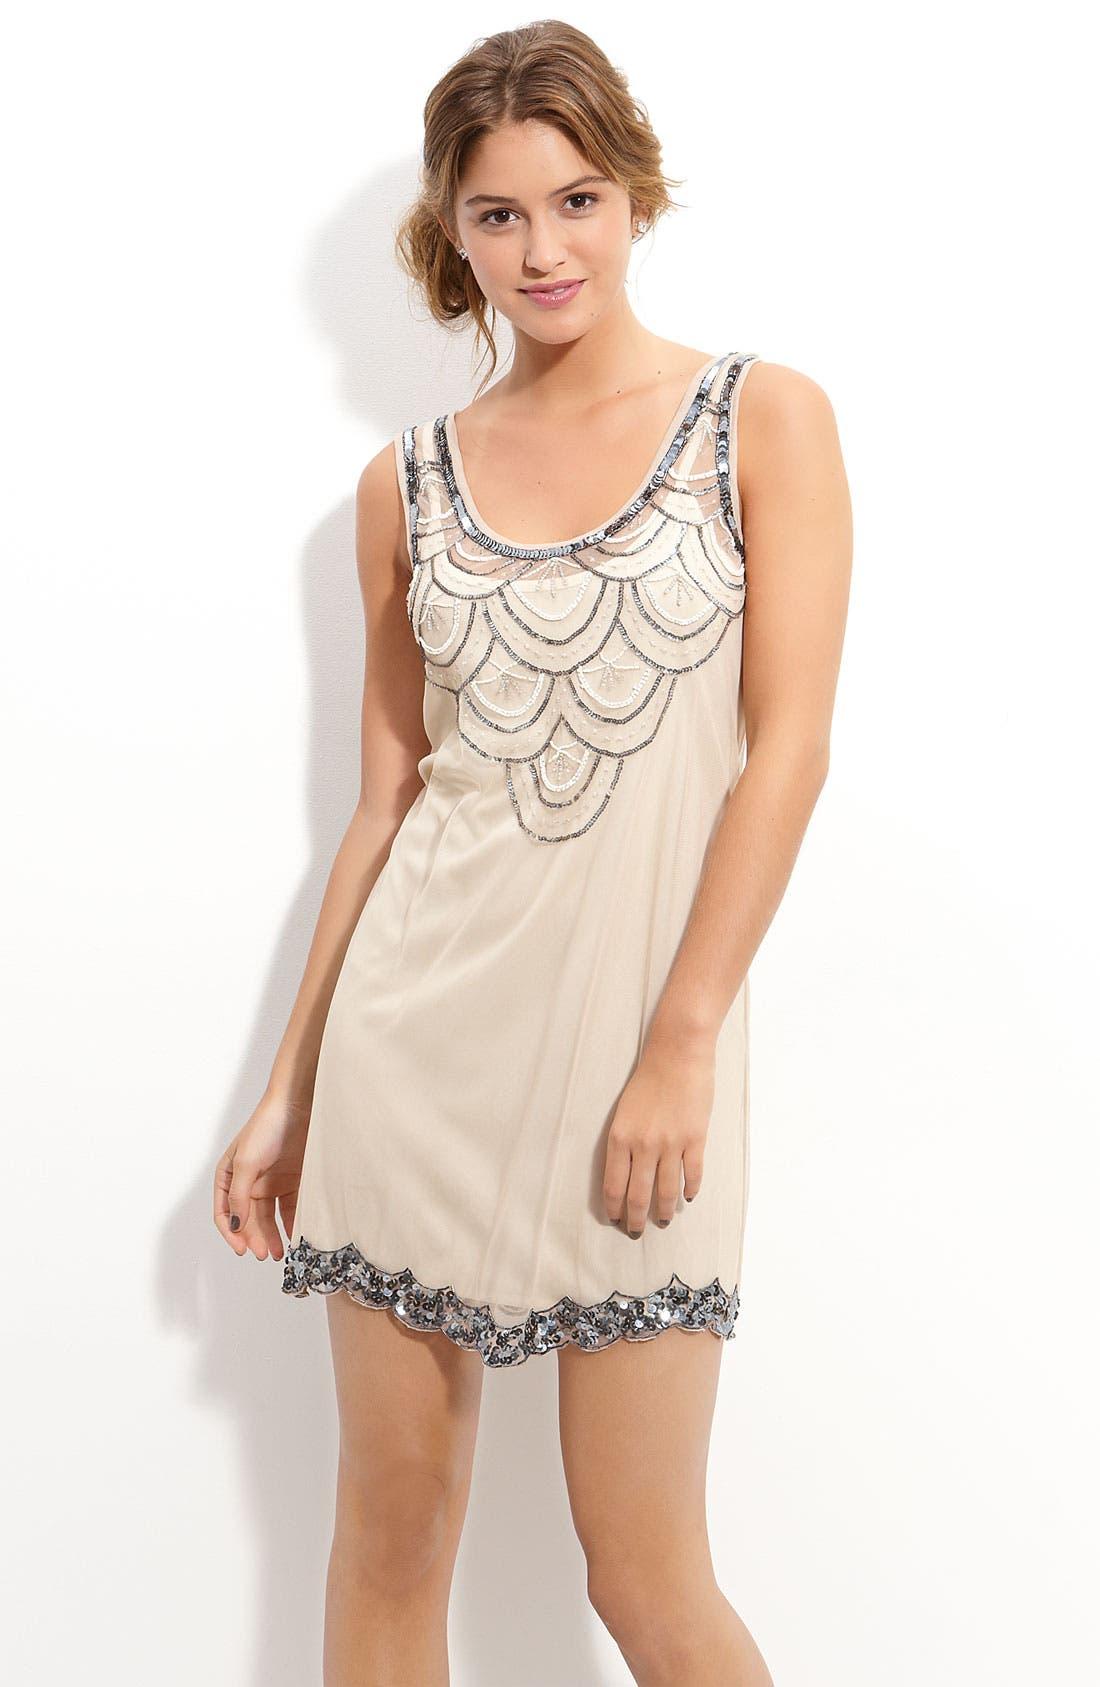 Alternate Image 1 Selected - Angie Bead & Sequin Embellished Sleeveless Dress (Juniors)